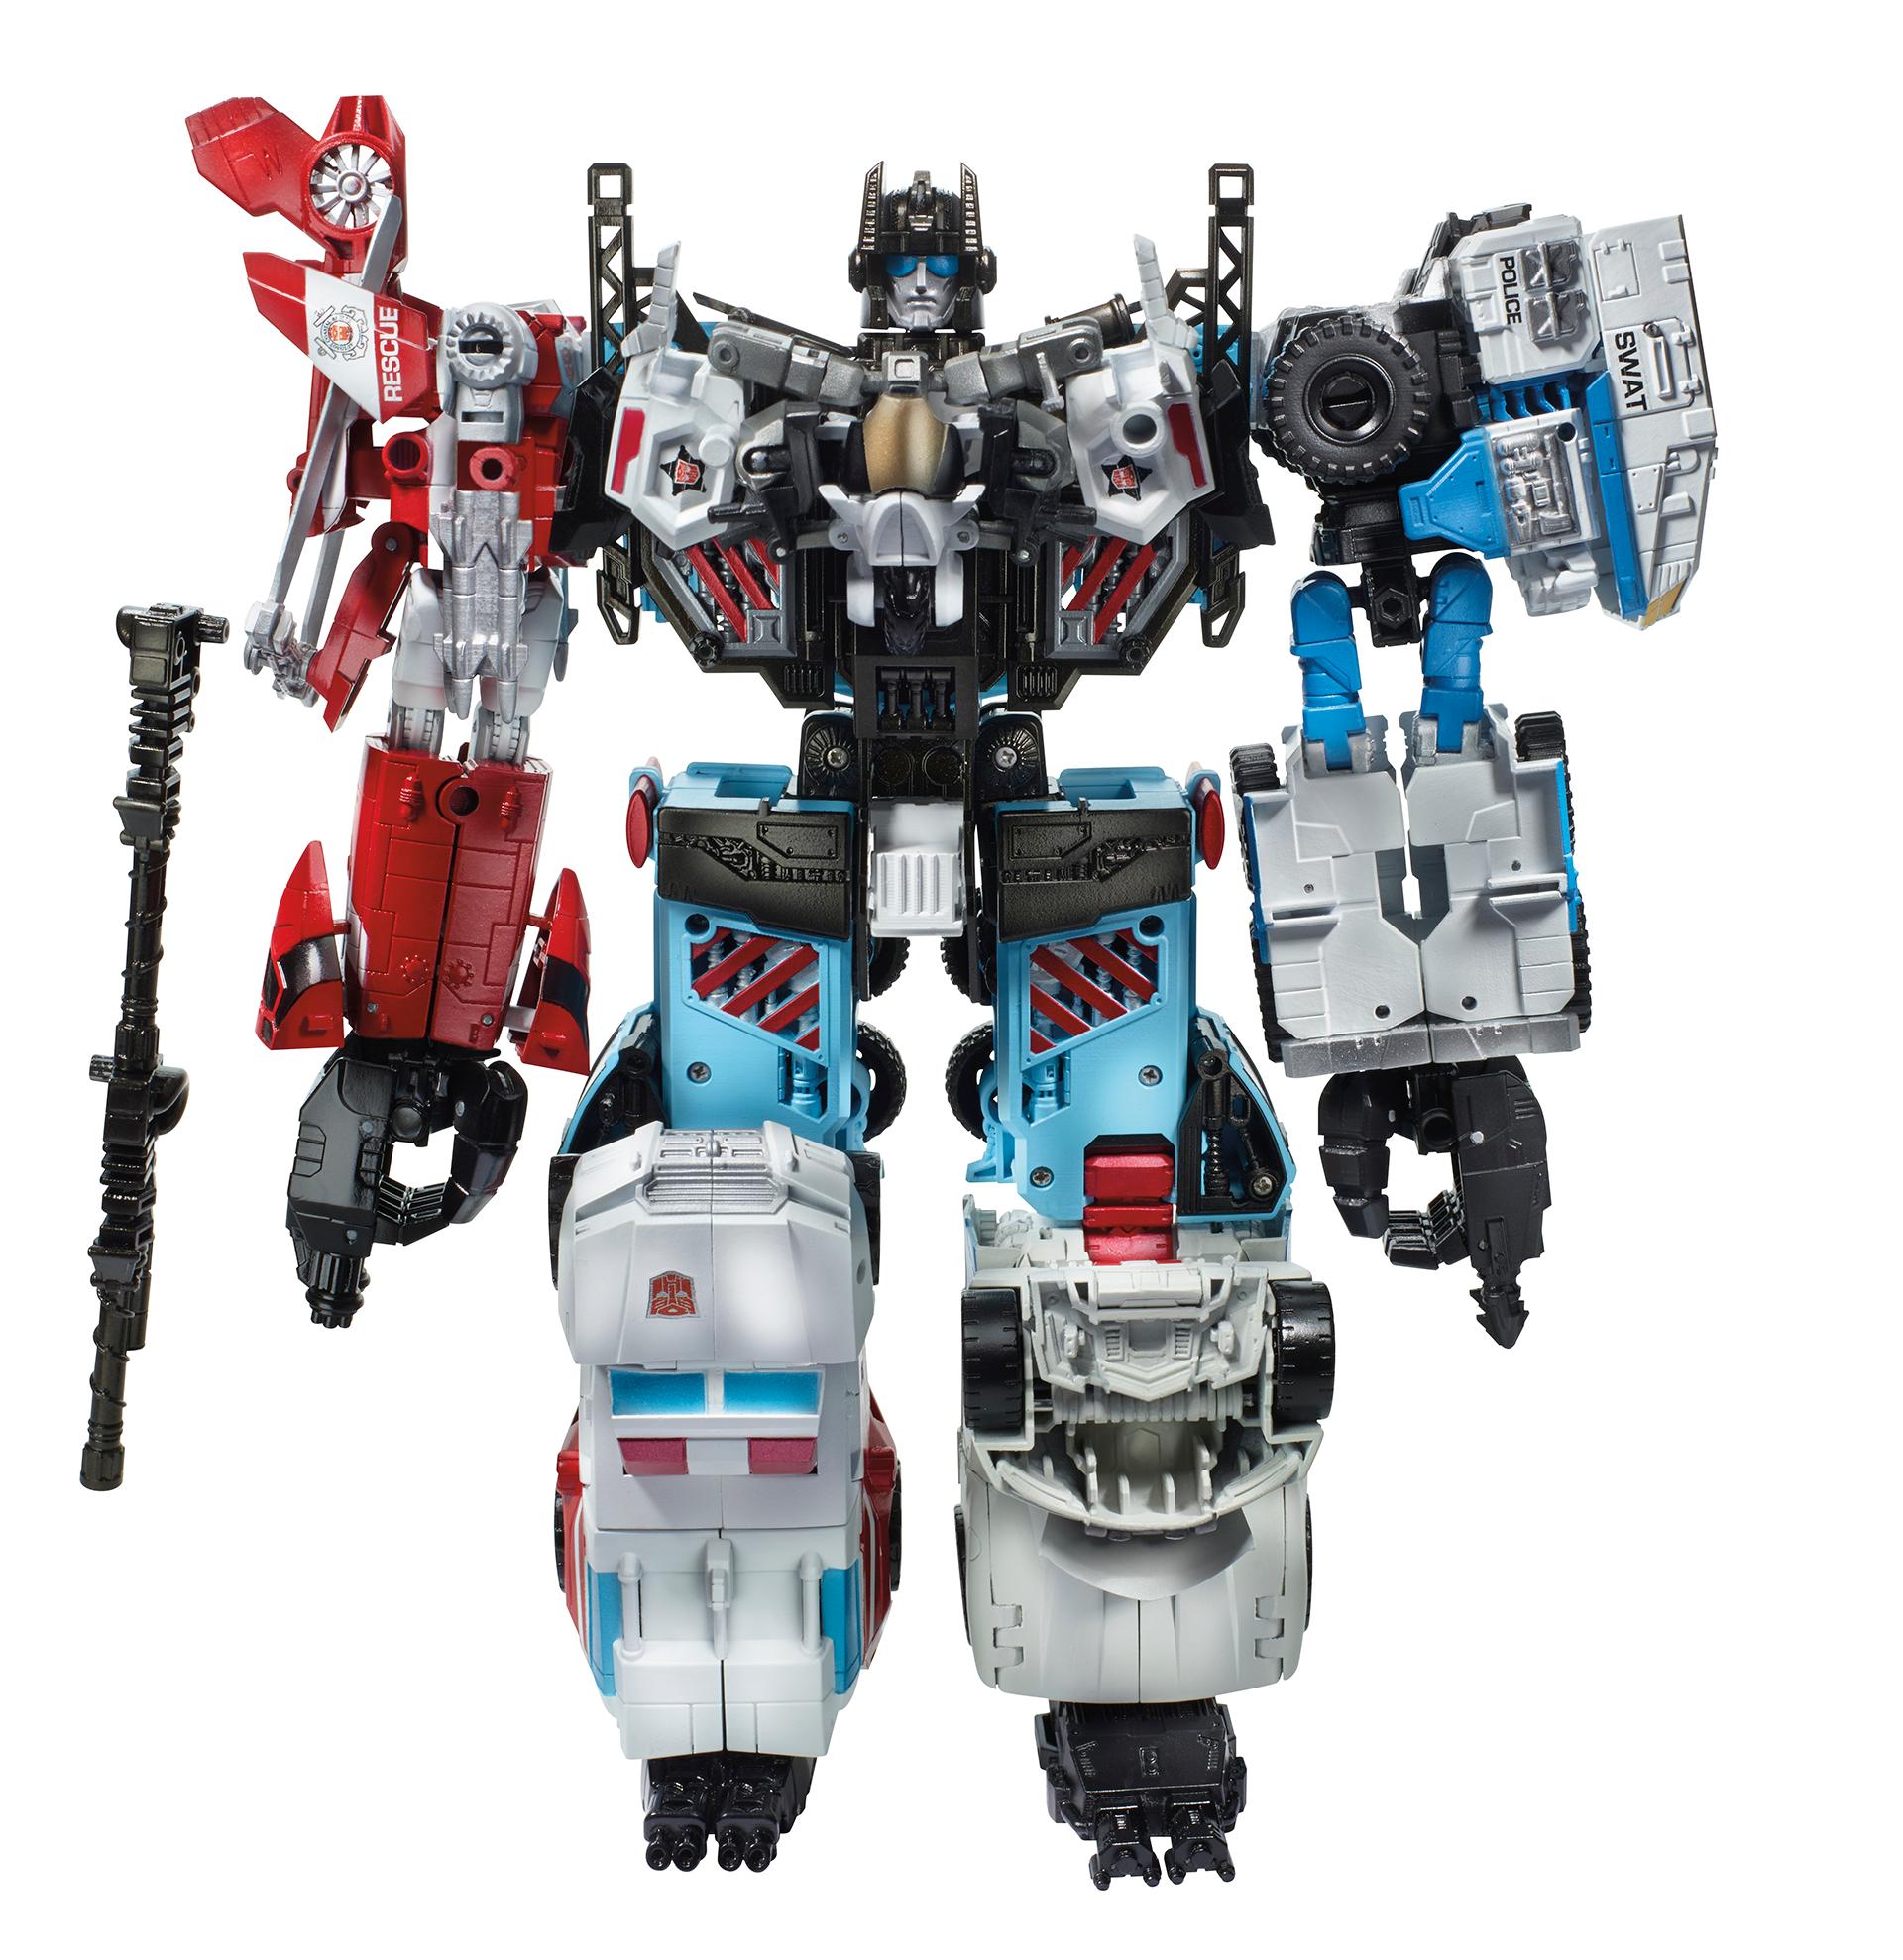 Combiner Wars Devastator & autres robots de la gamme Lrhclw7cwsmpw2palsog